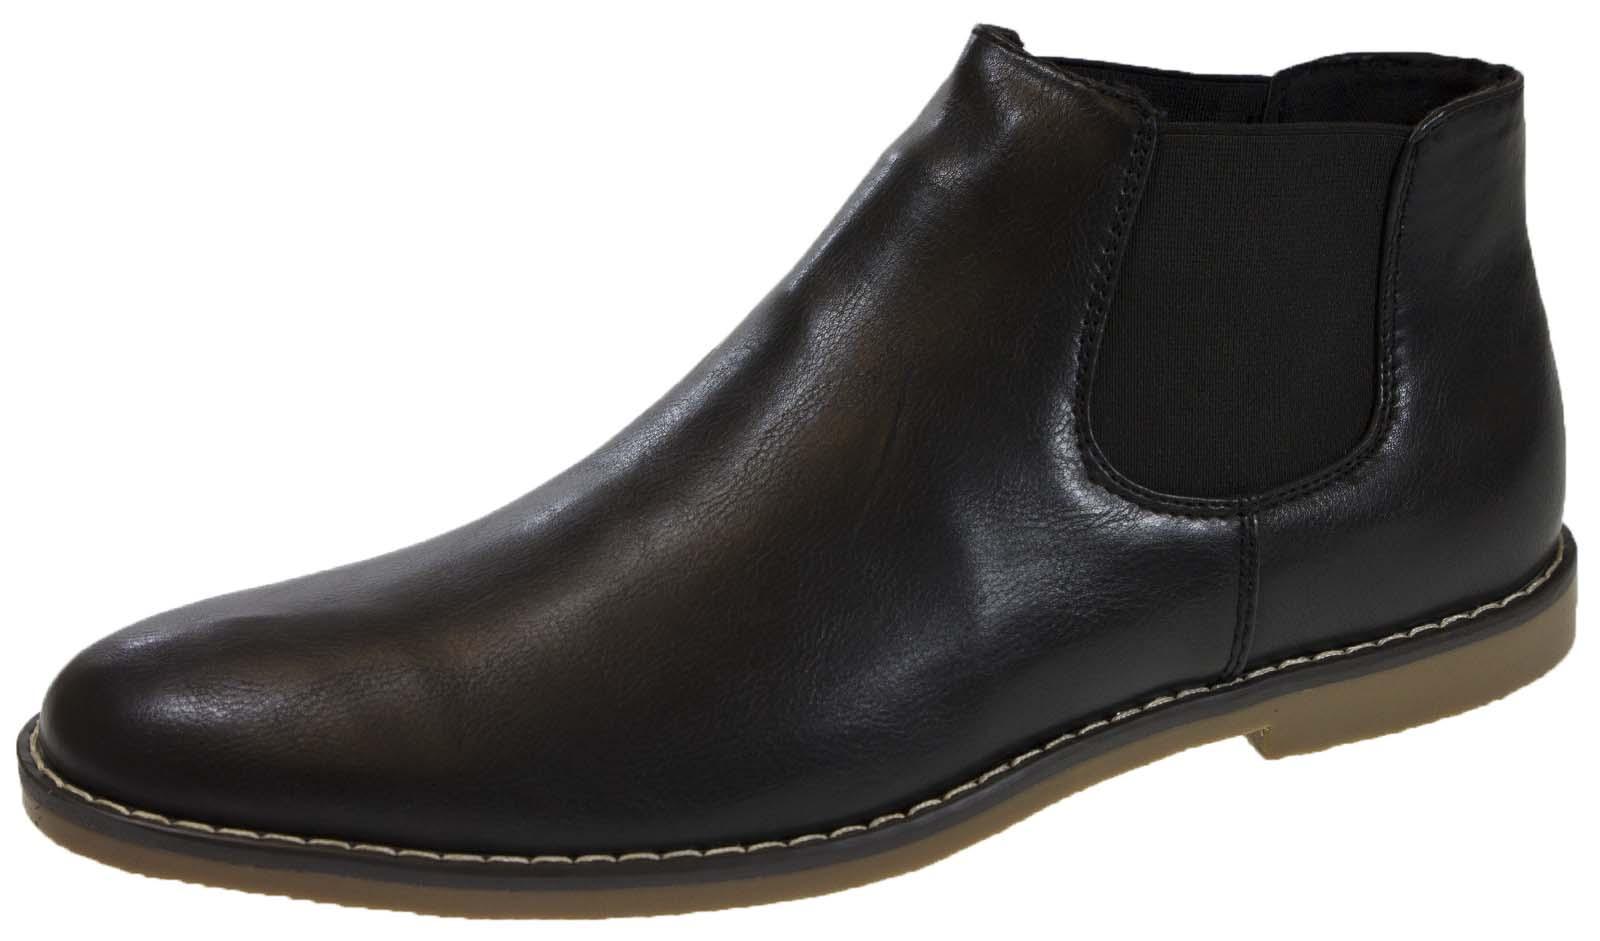 Mens slip on boots